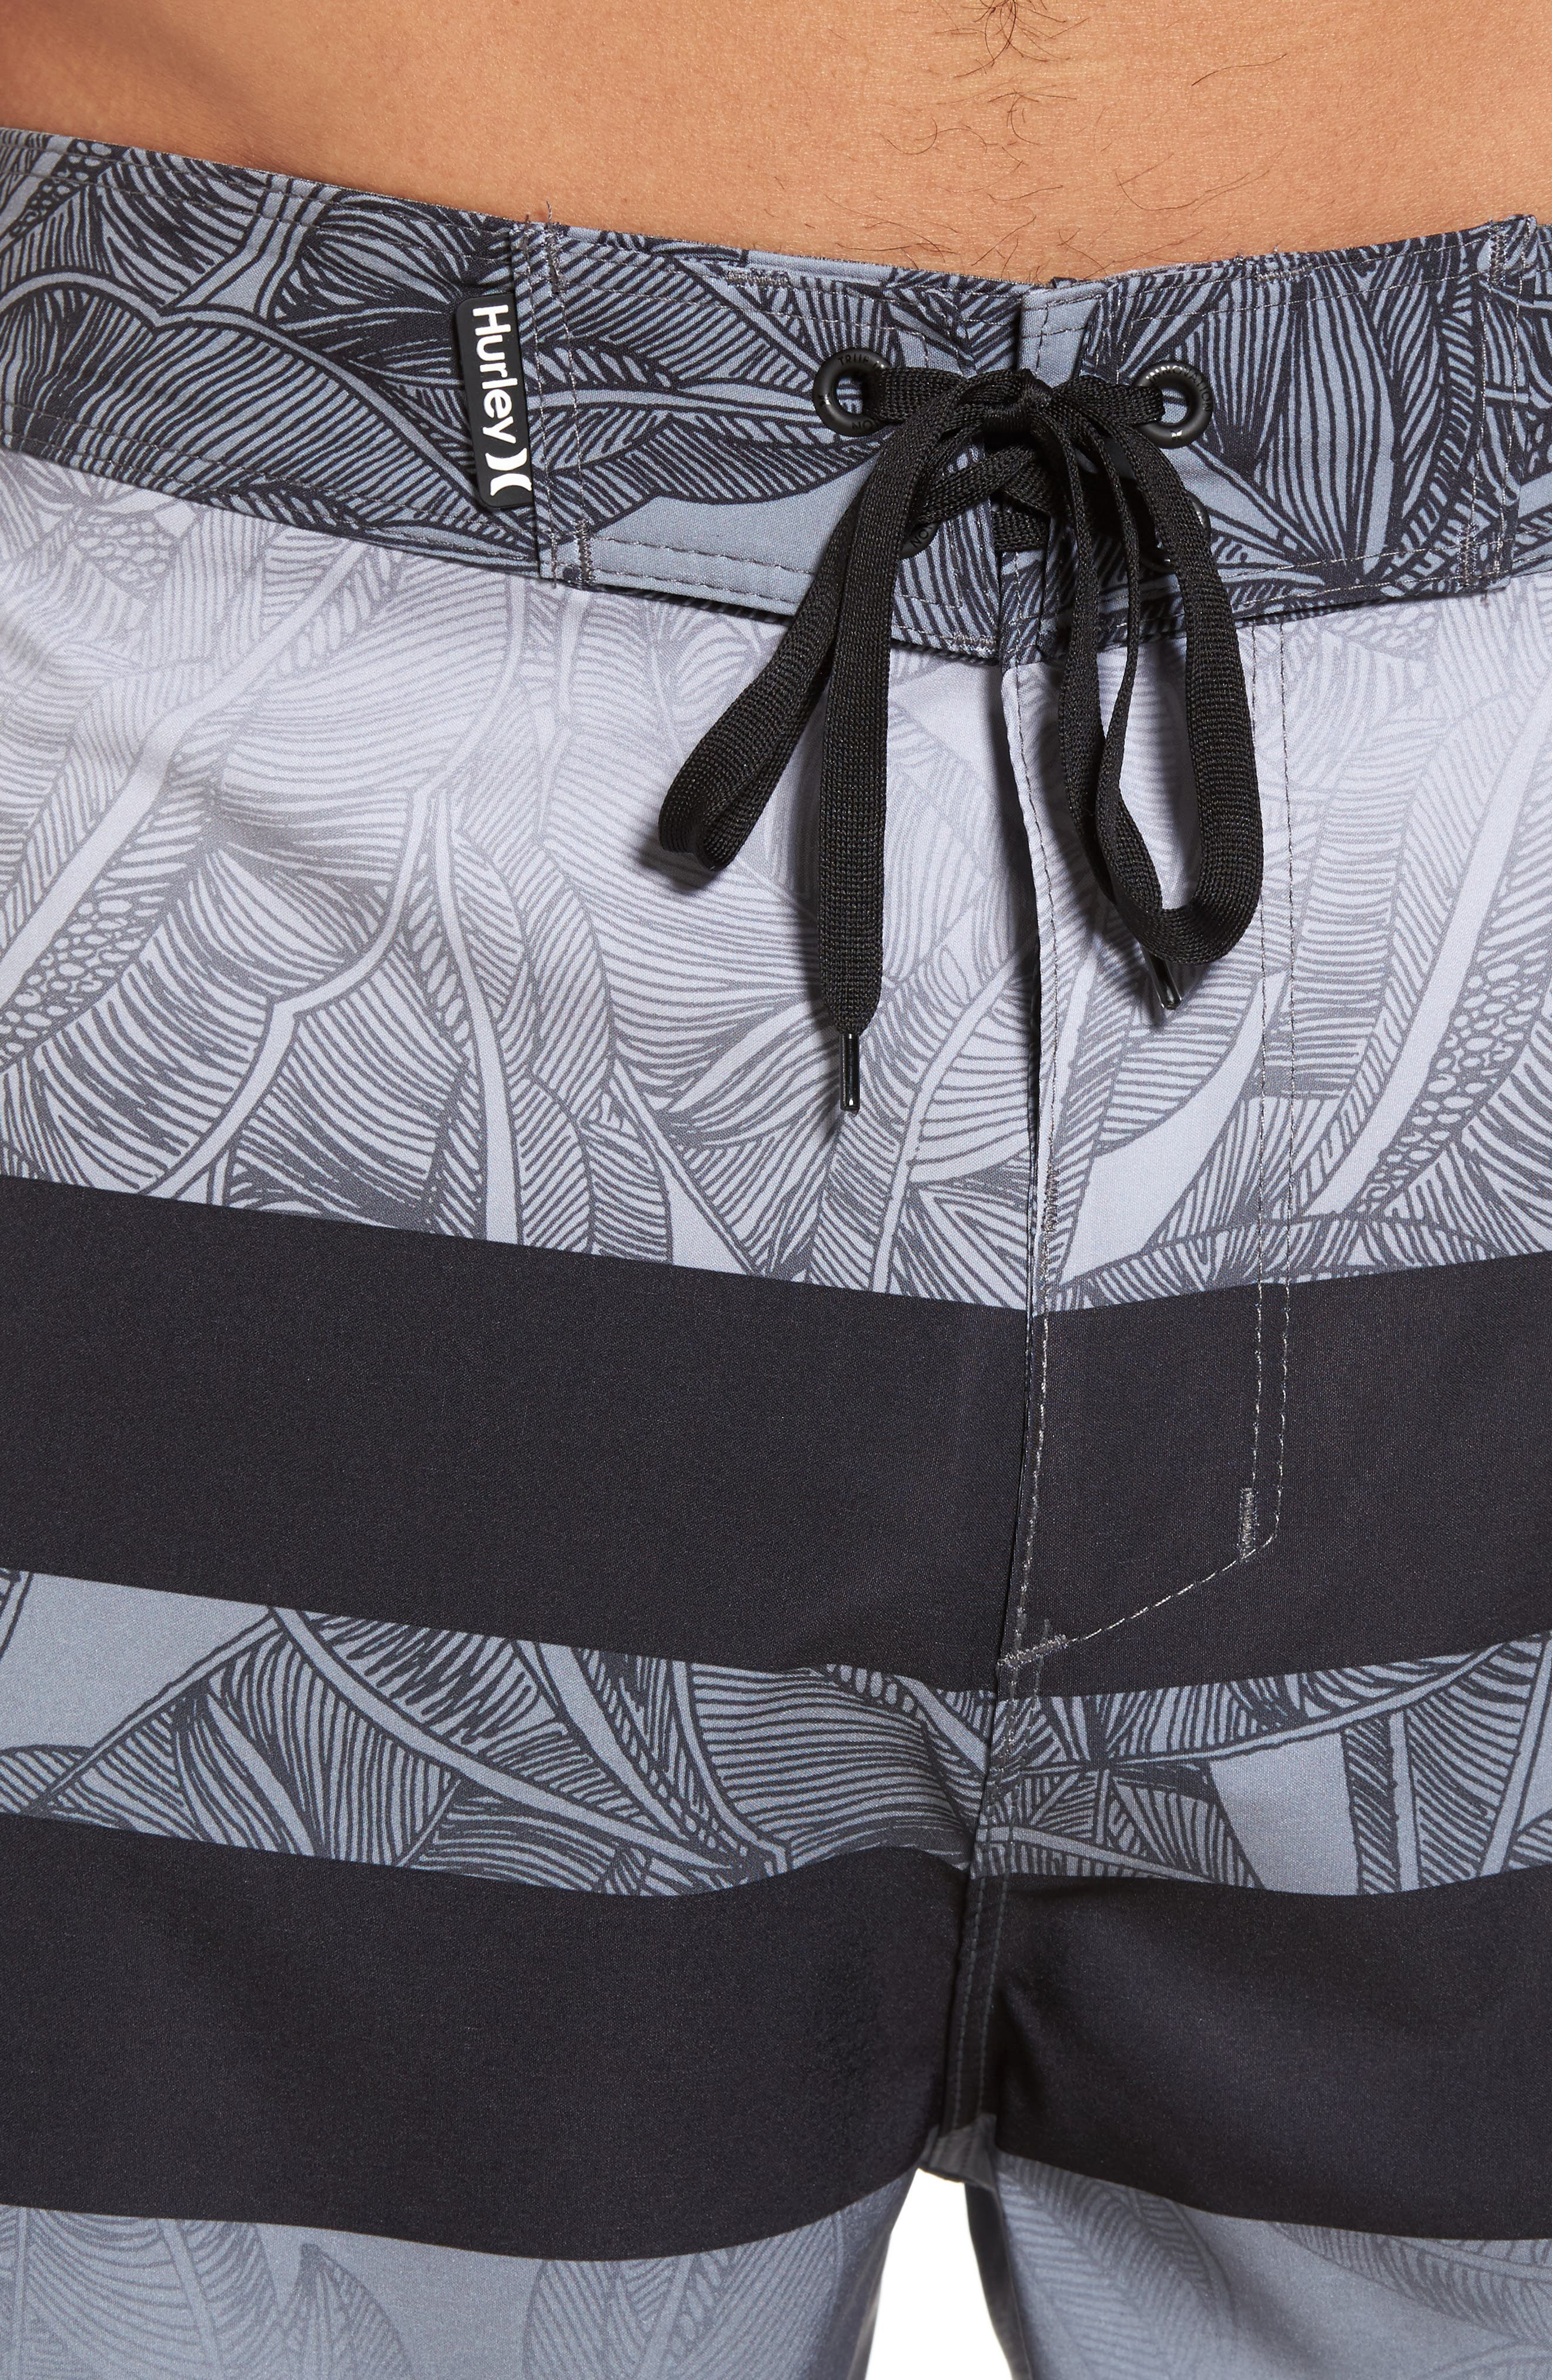 Phantom Blackball Board Shorts,                             Alternate thumbnail 4, color,                             010